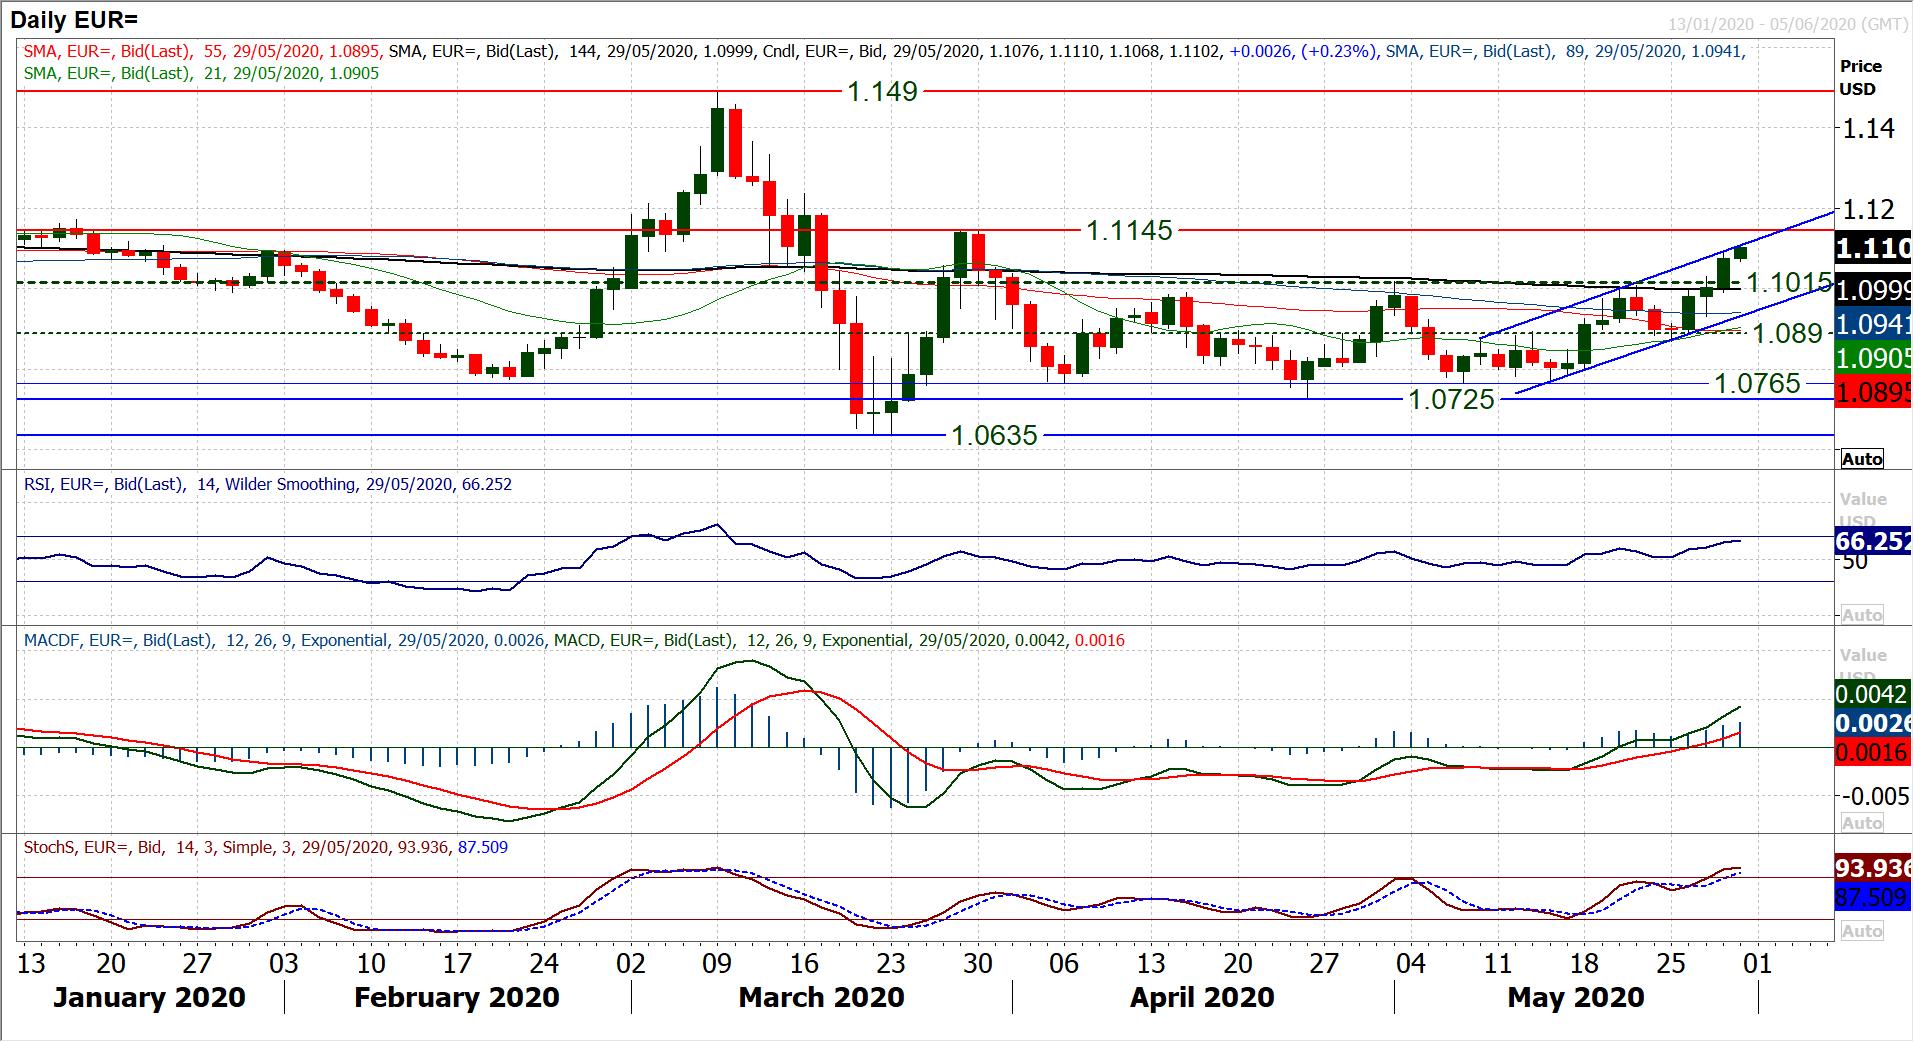 https://www.poundsterlinglive.com/images/graphs/EUR-USD-f0recast-chart.png